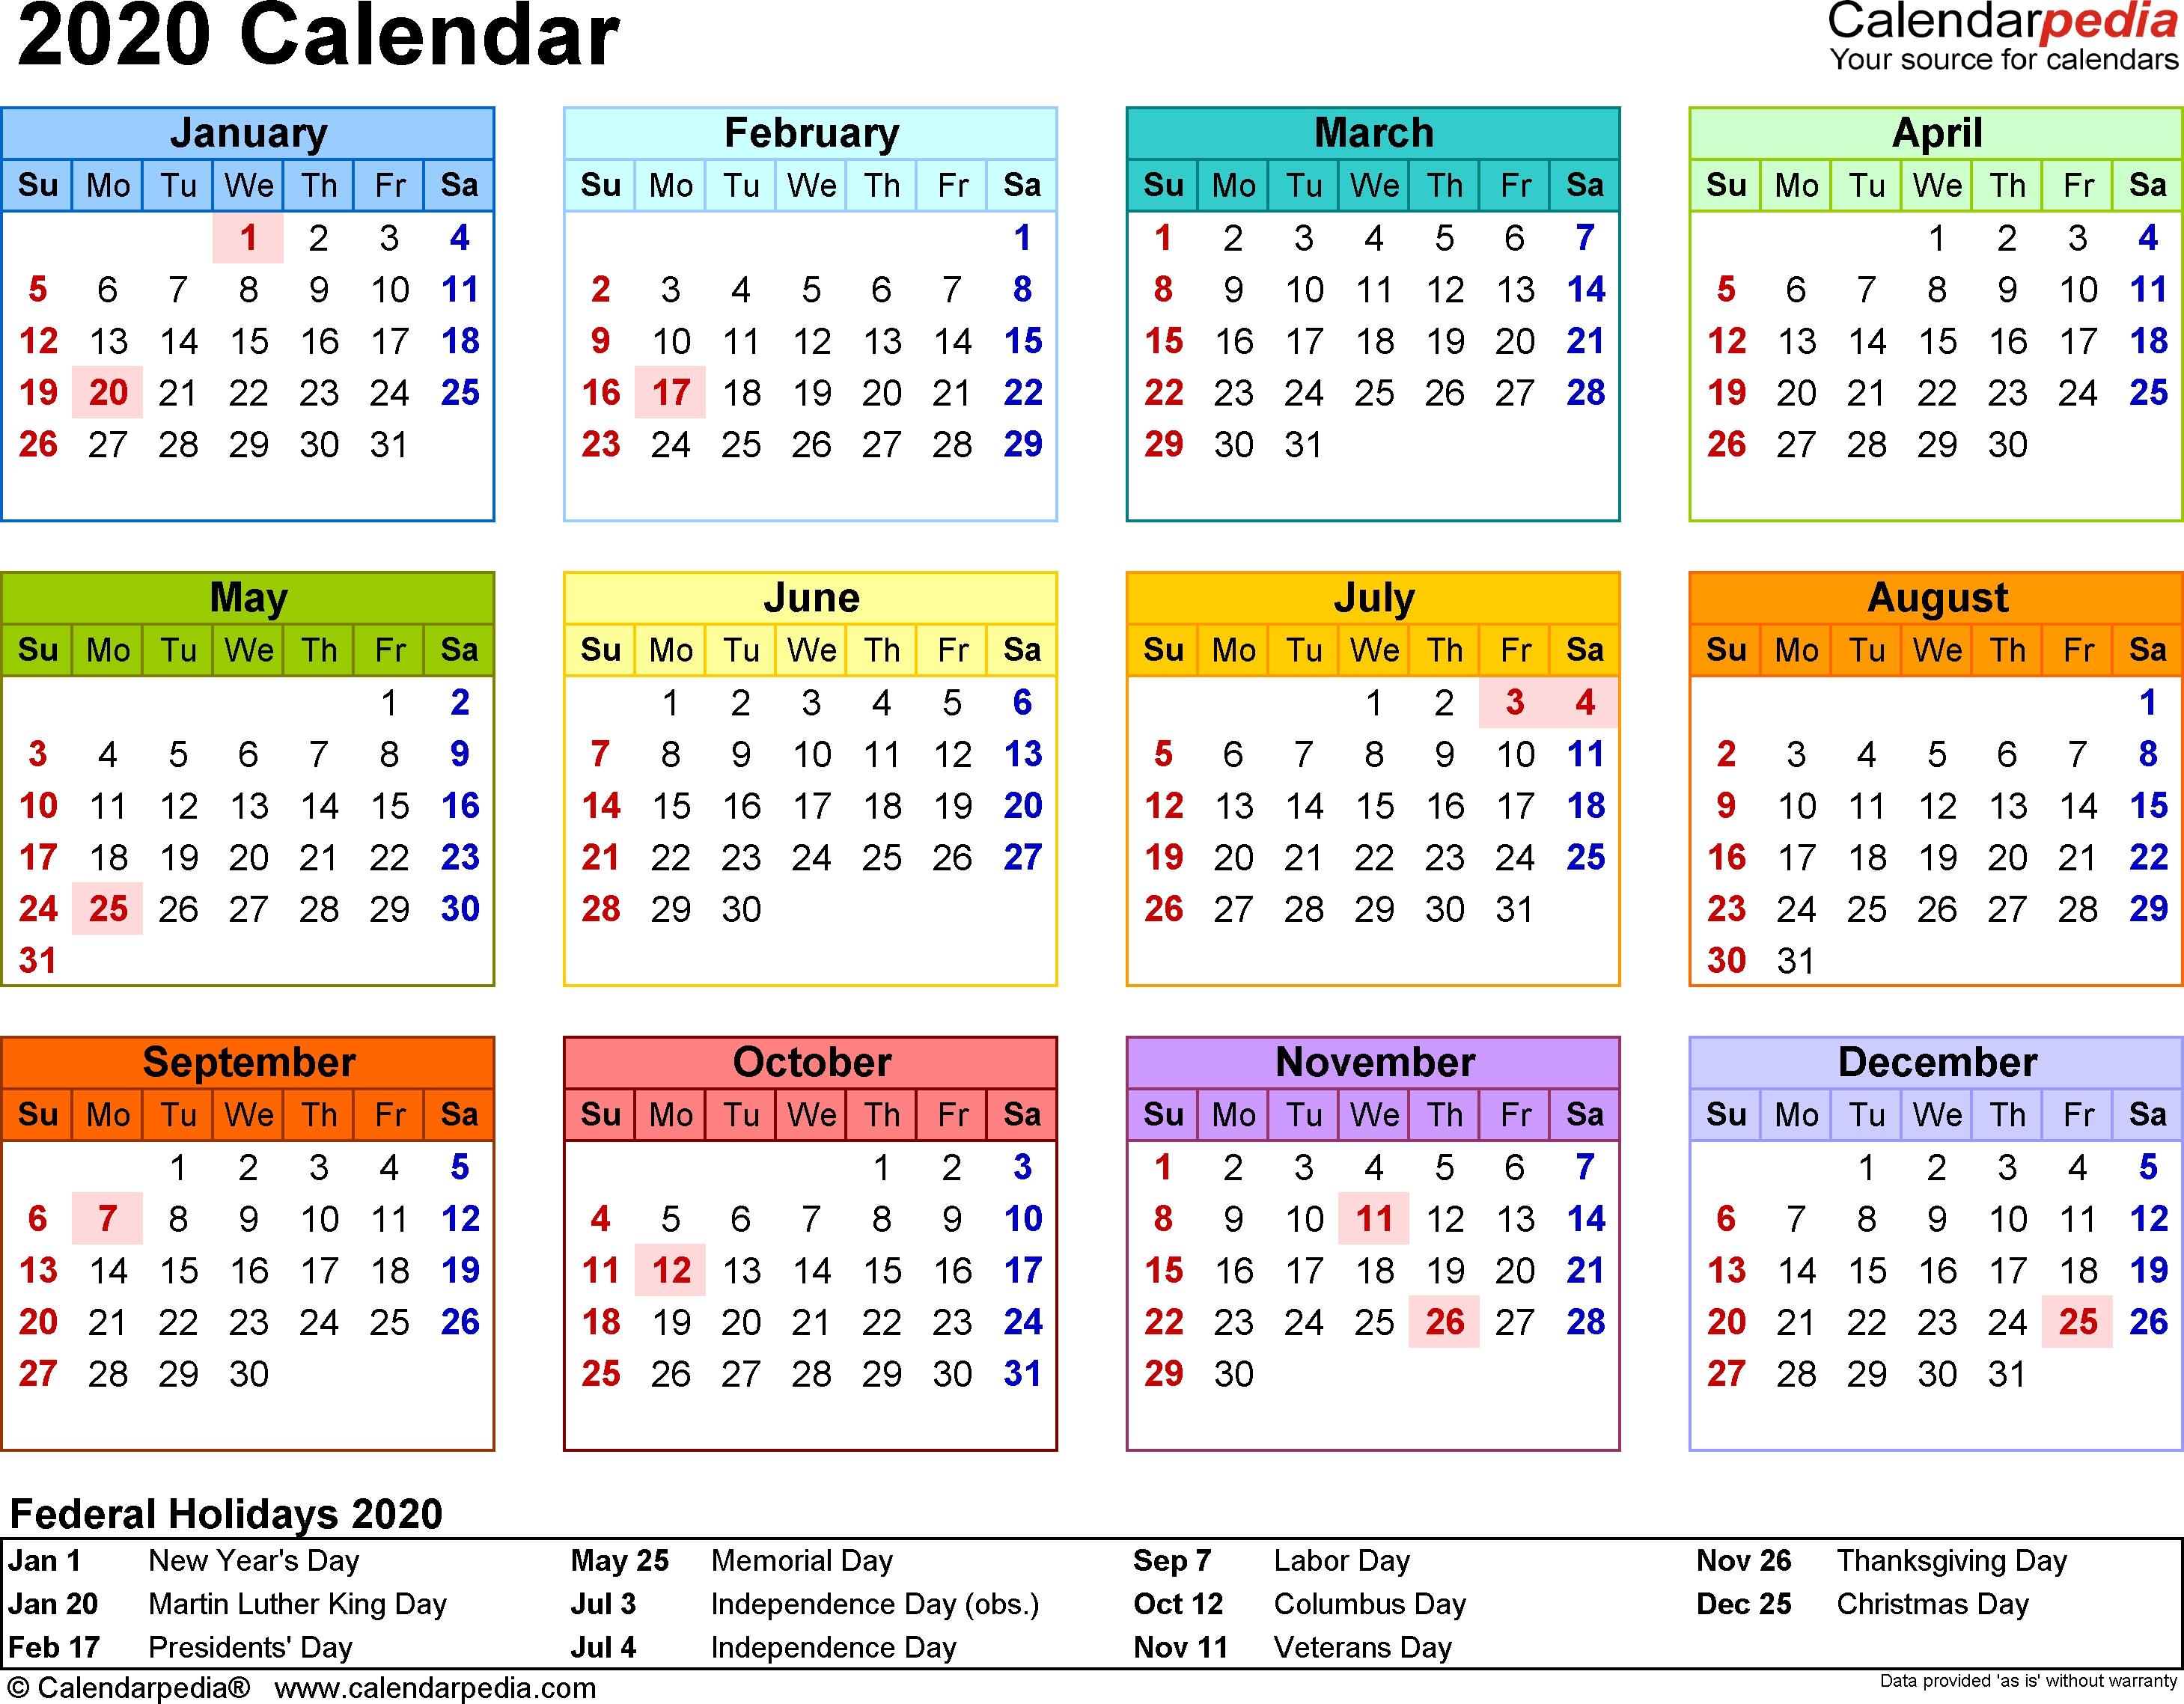 2020 Calendar - 18 Free Printable Word Calendar Templates-Calendar For 2020 Indicating Public Holidays